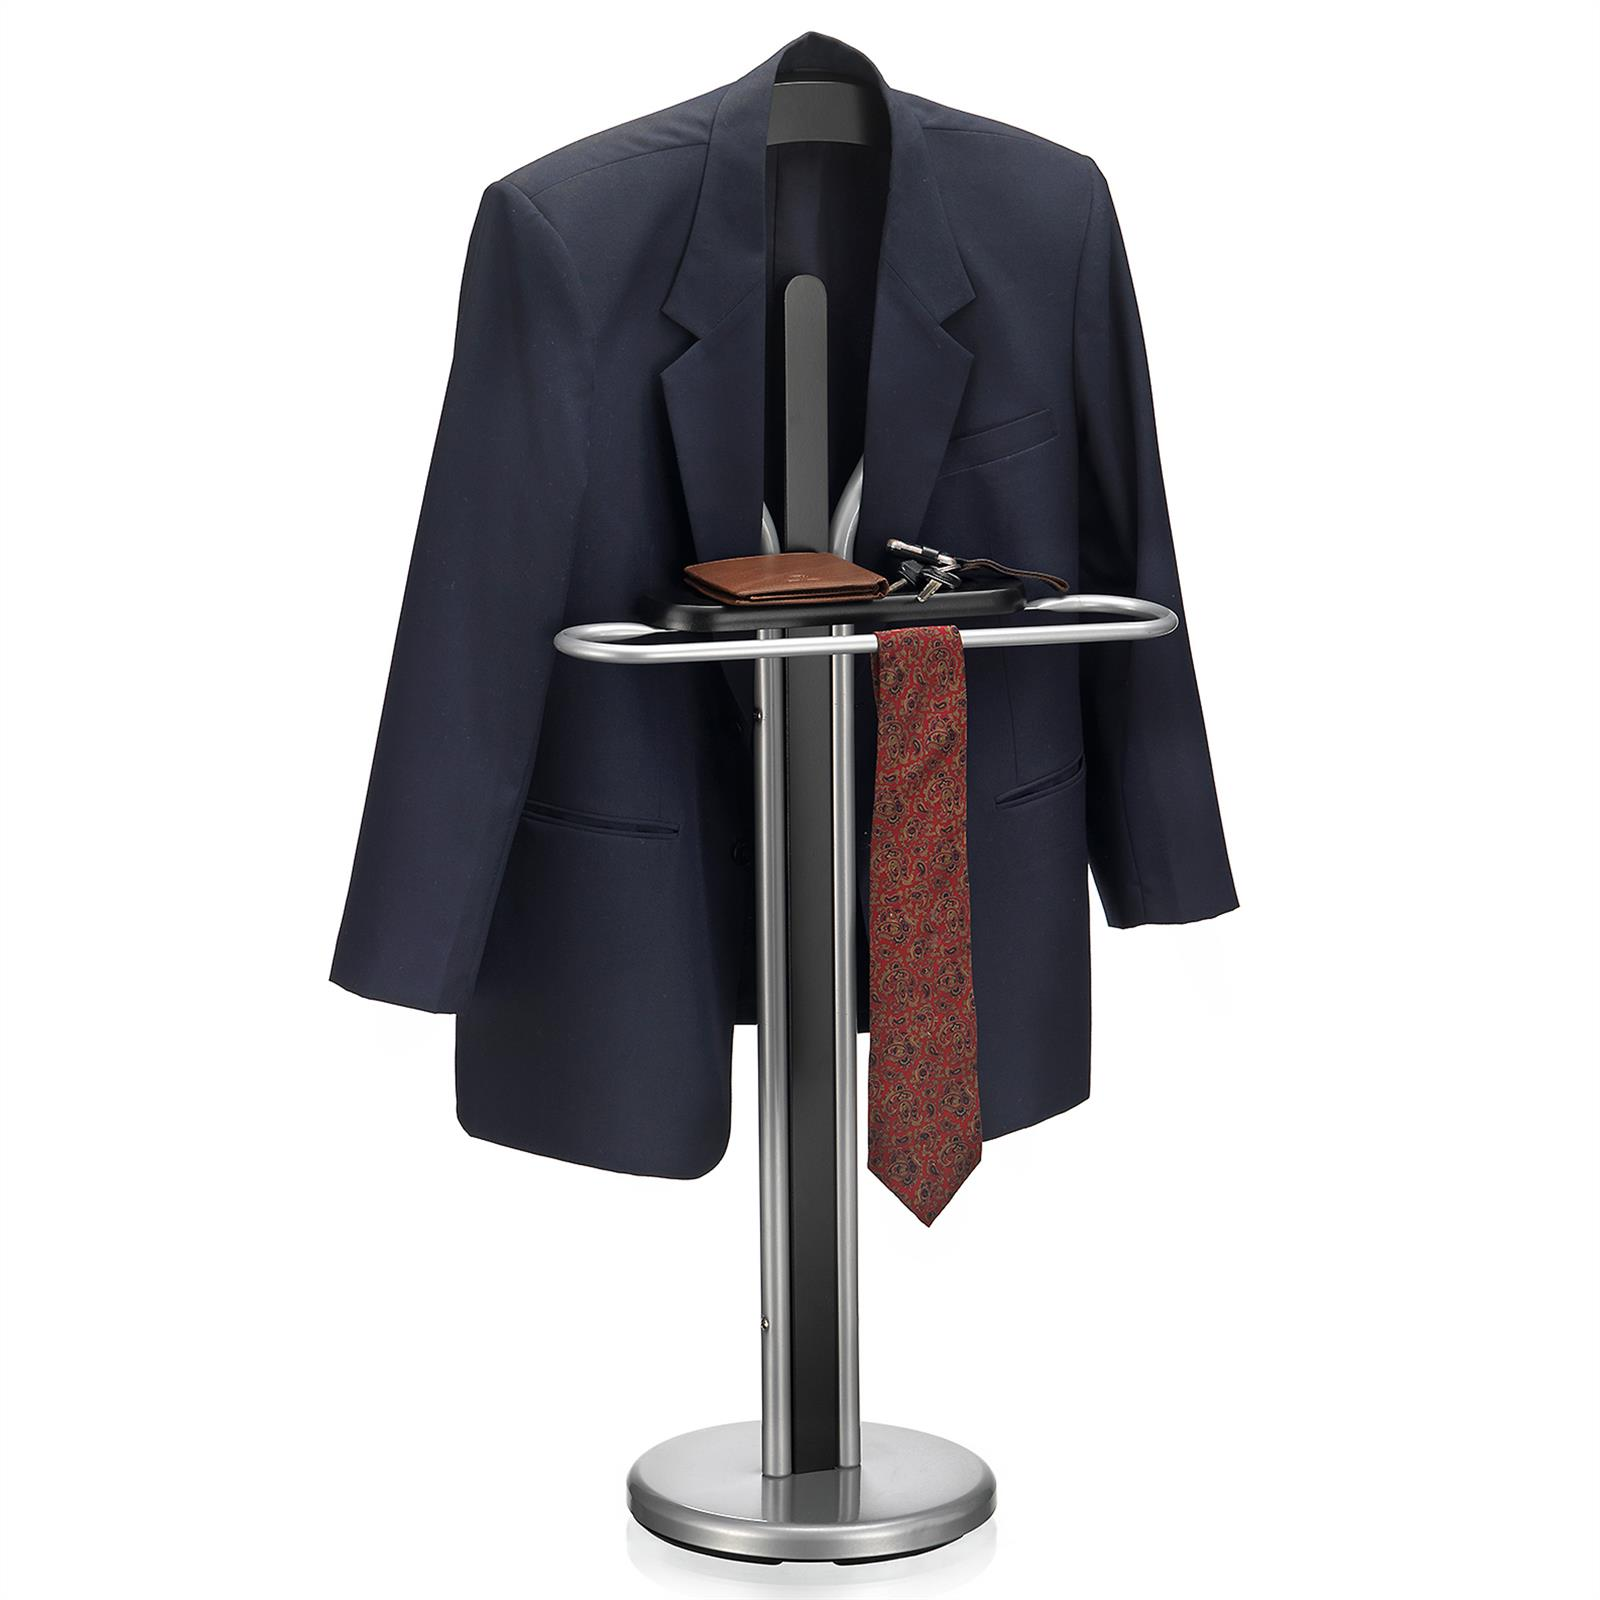 herrendiener stummer damen diener kleiderbutler kleiderb gel hosenb gel 5 farben ebay. Black Bedroom Furniture Sets. Home Design Ideas